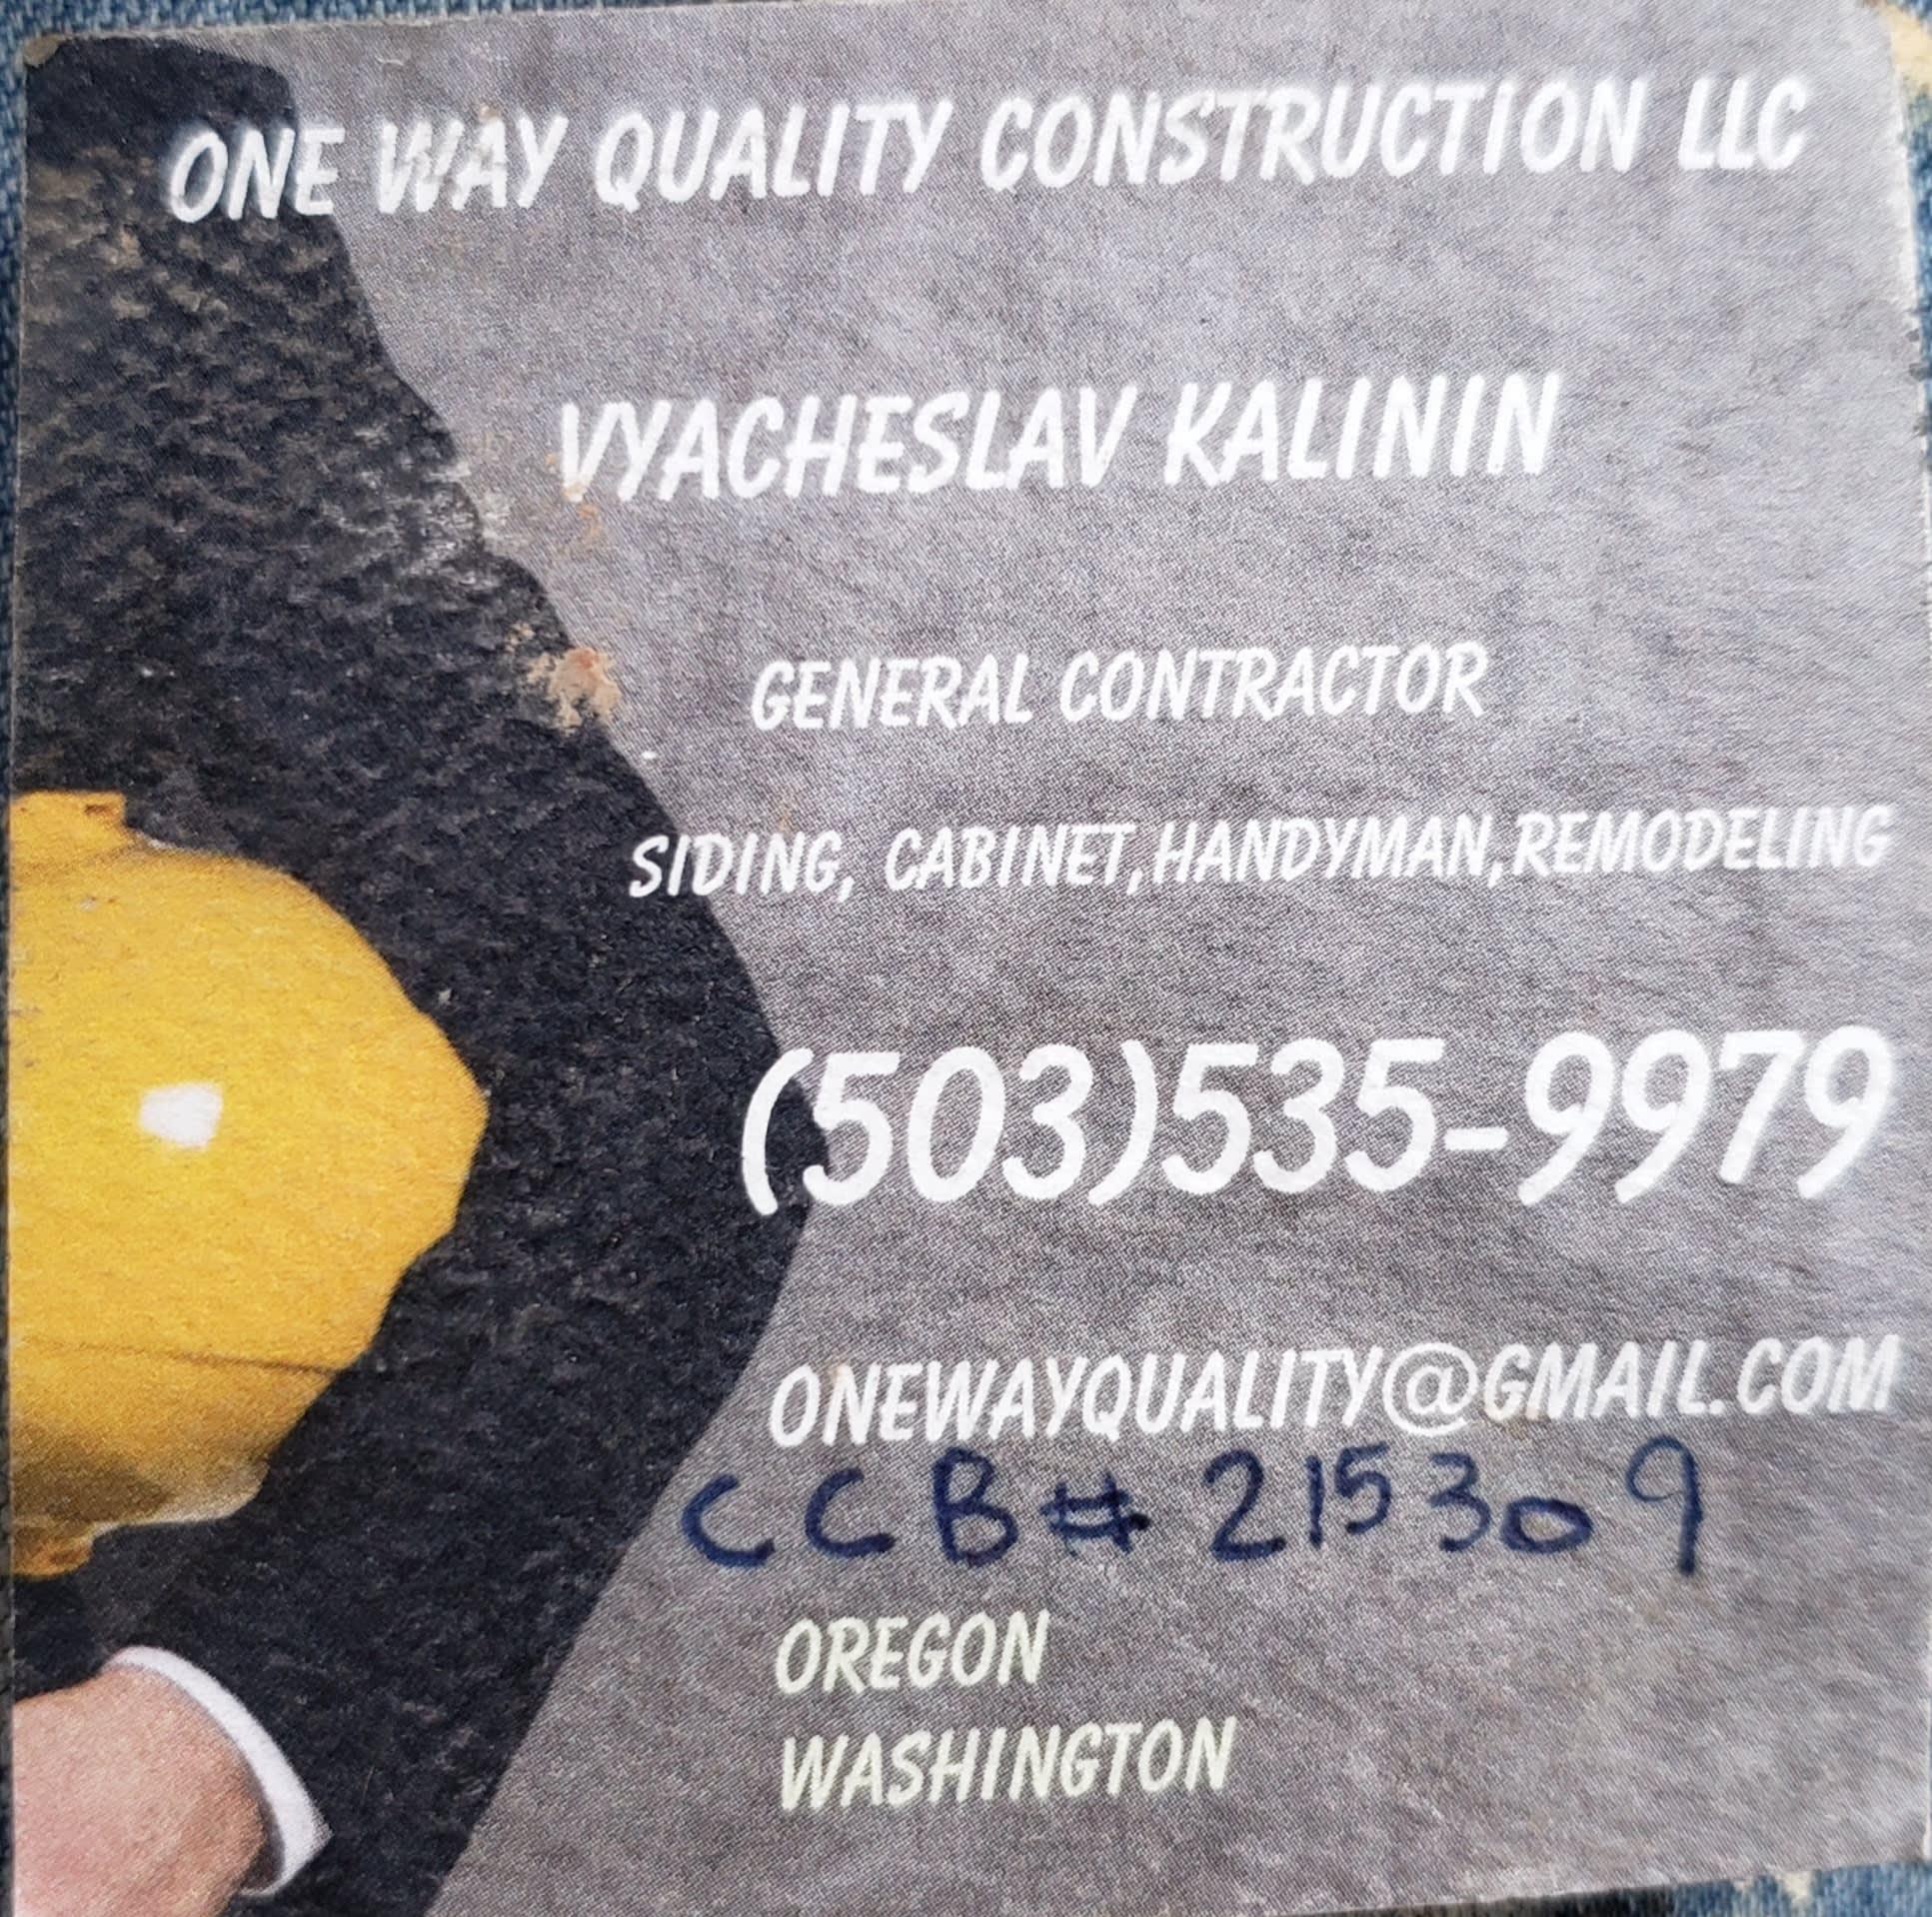 One Way Quality Construction LLC